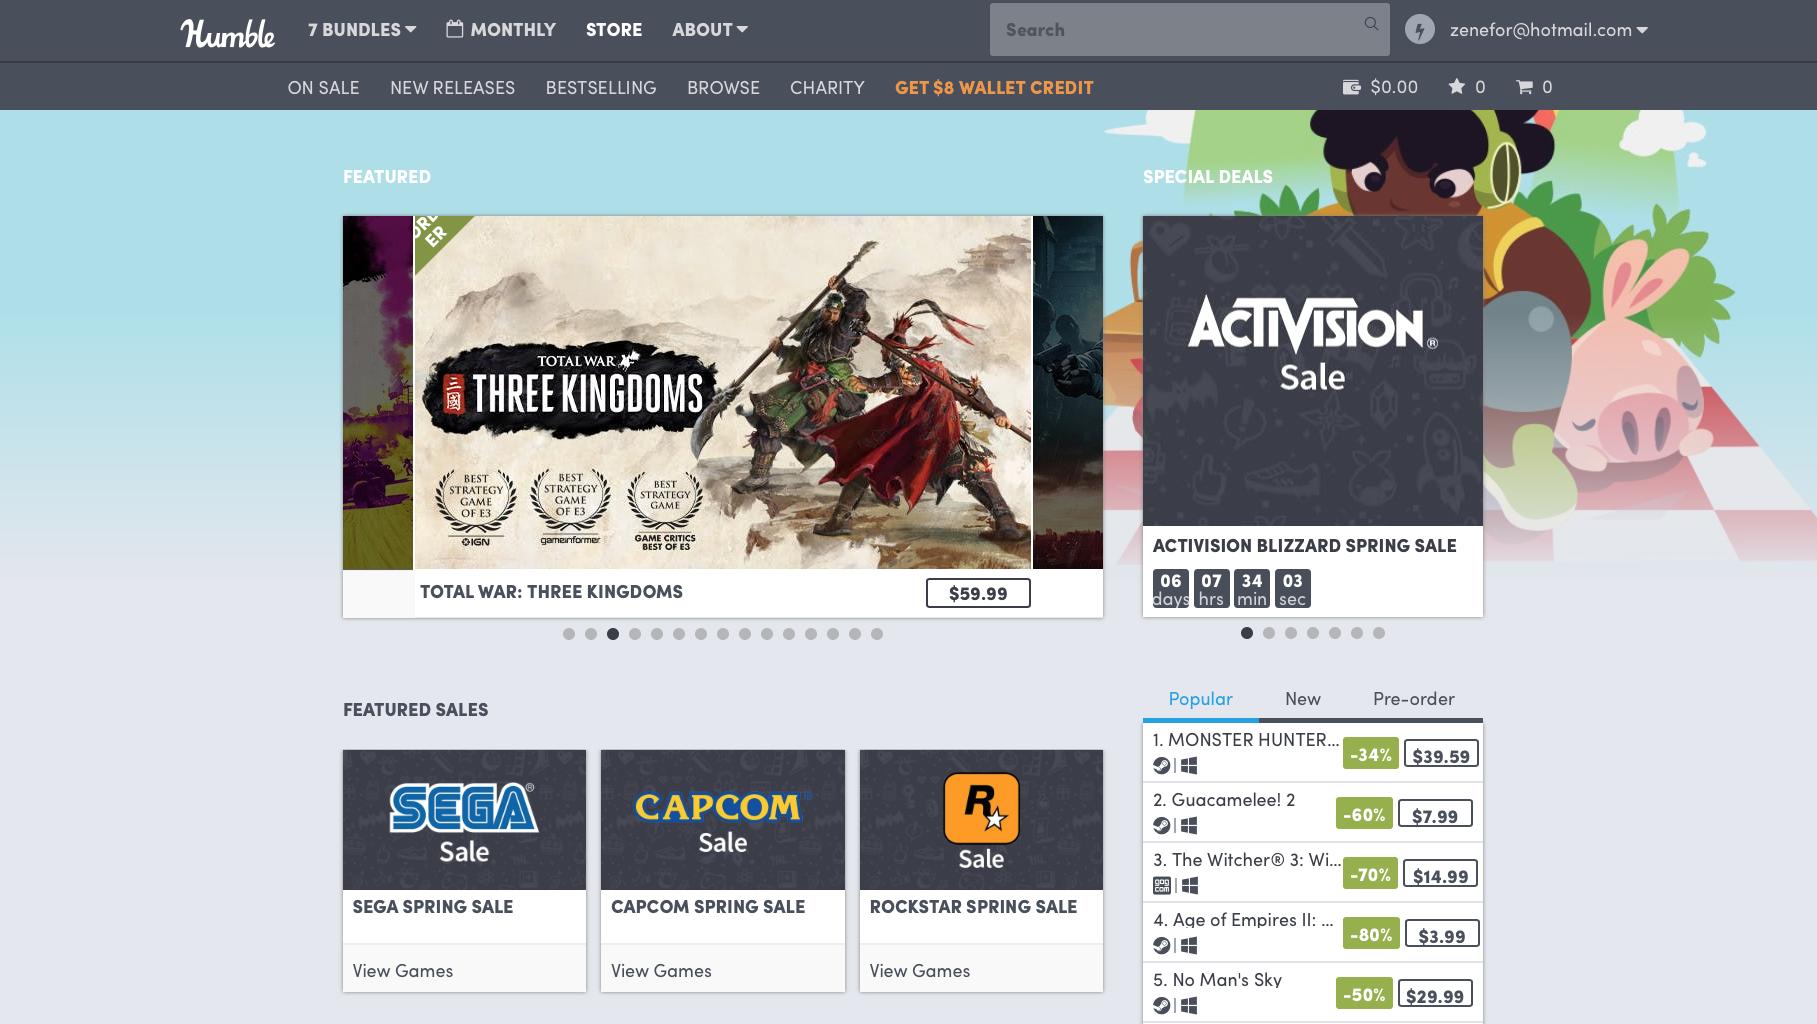 Deal Alert: Acer SA220QA, XCOM 2, Epic Mega Sale and more - GameAxis